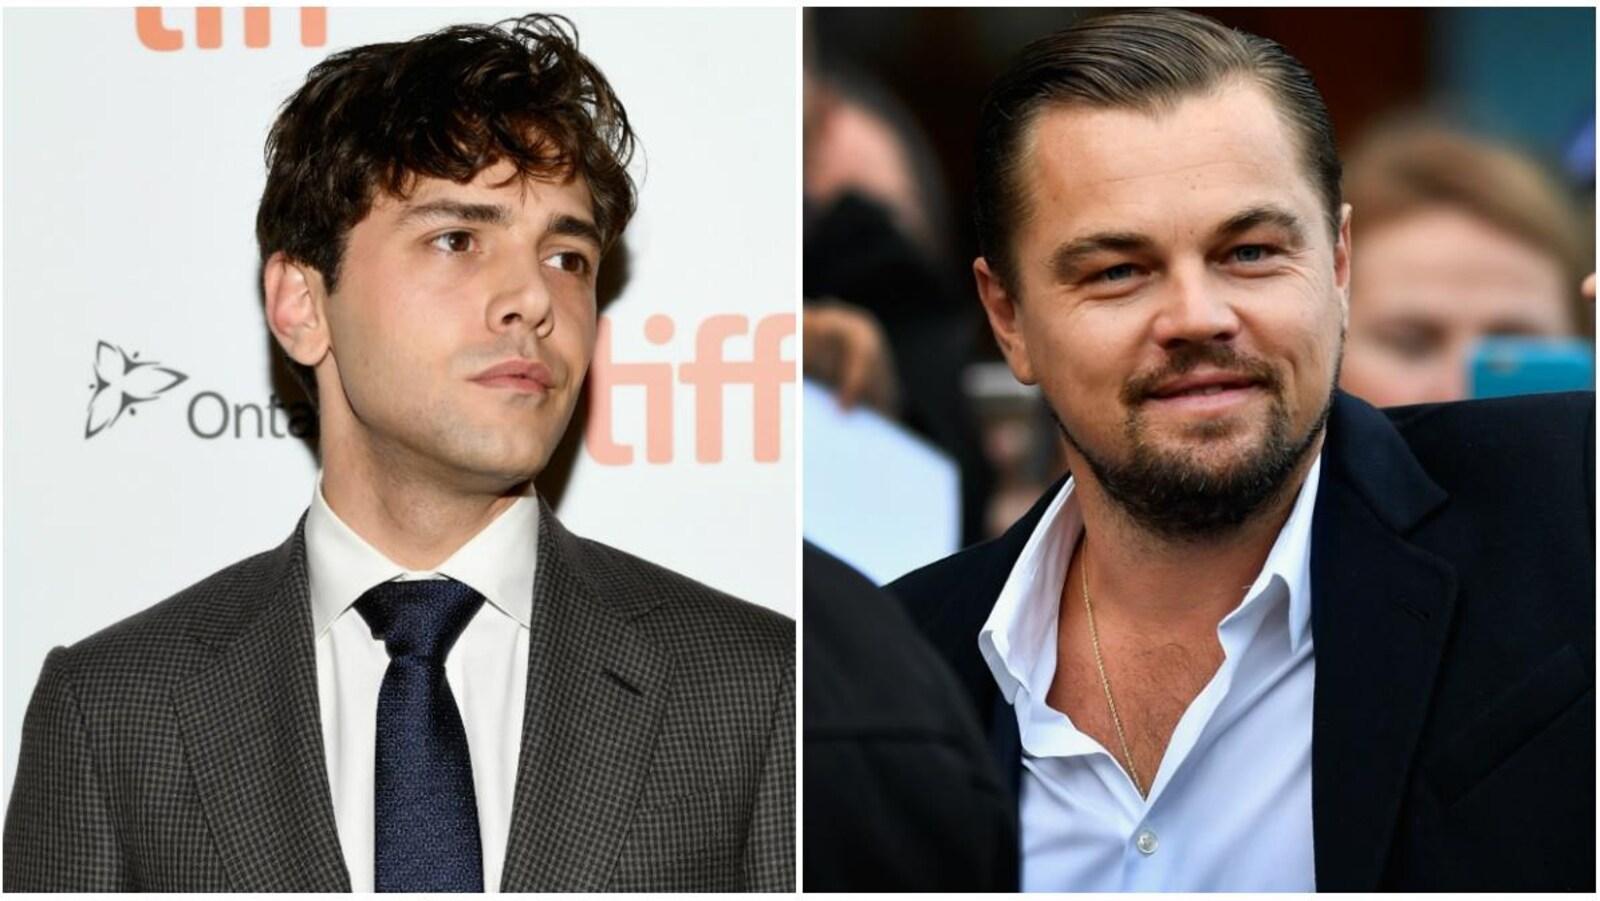 Xavier Dolan et Leonardo DiCaprio sur divers tapis rouges.